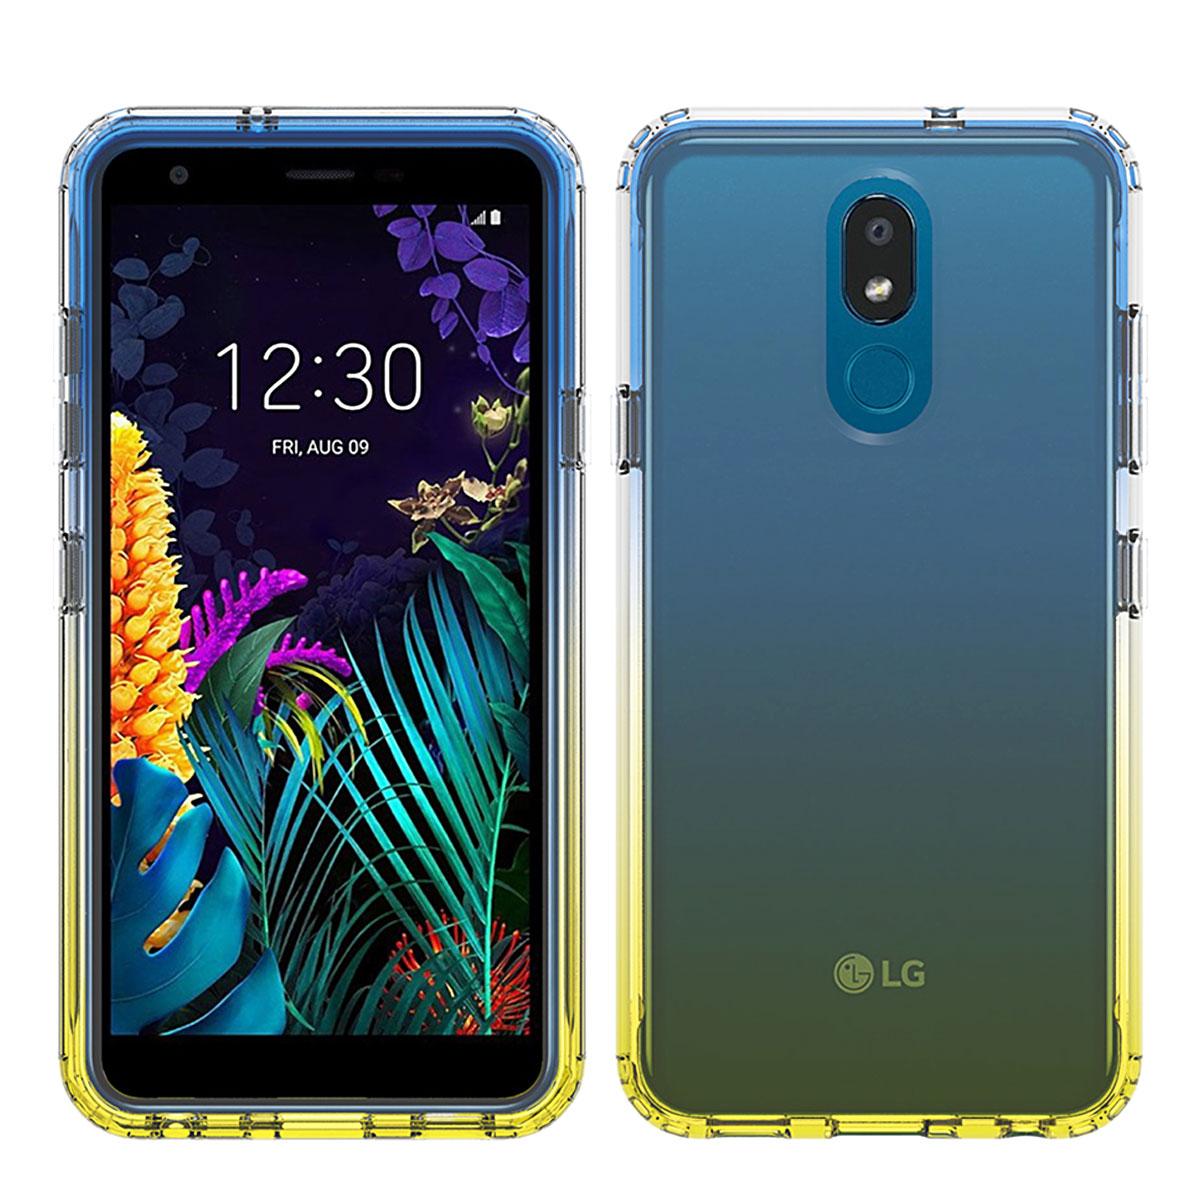 LG-ASTO4PL-T-2TN-GD-BLYL